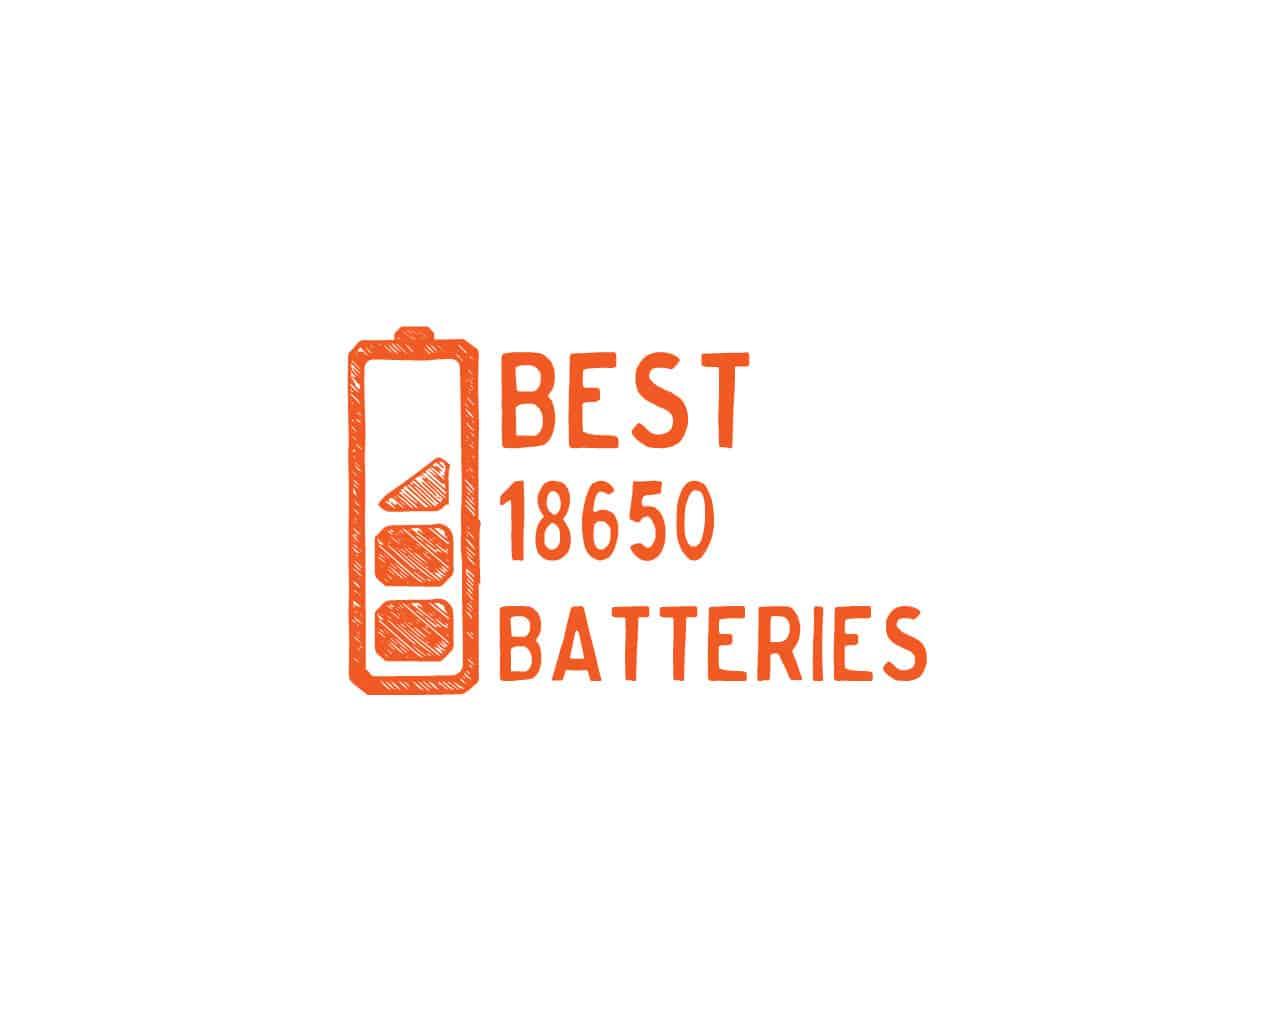 Best 18650 Vape Batteries